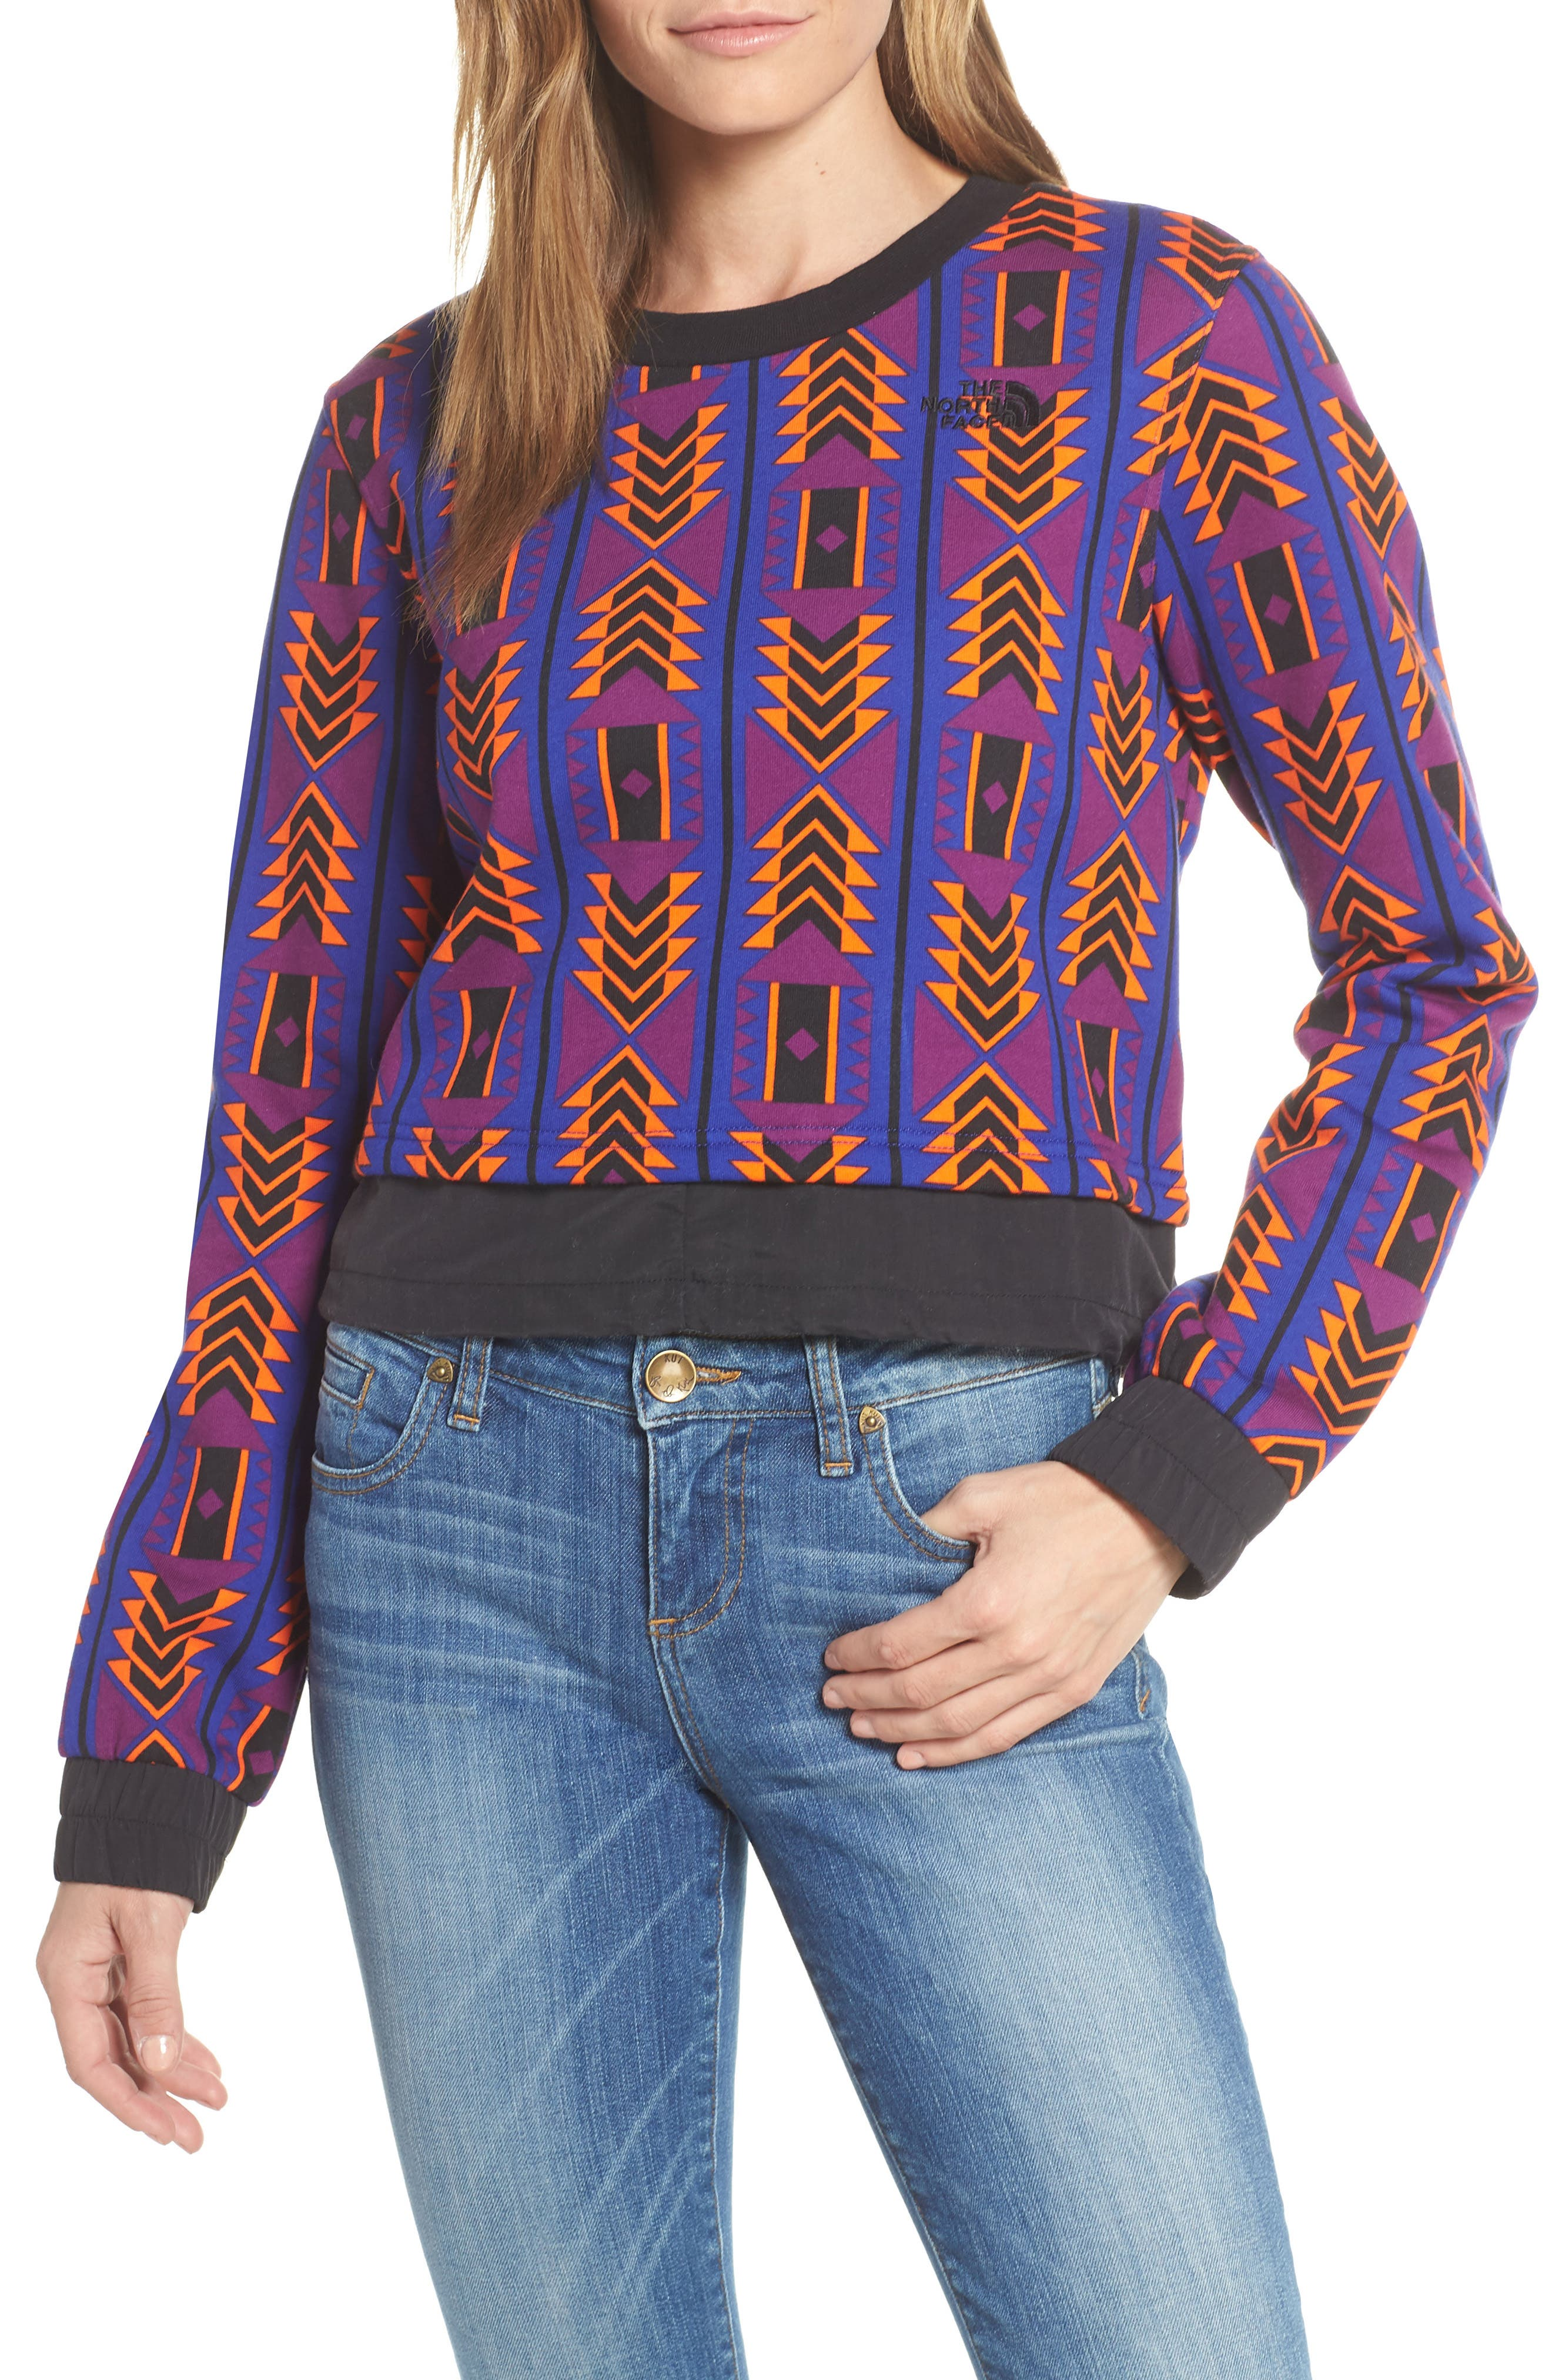 92 Rage Crop Fleece Sweatshirt,                             Main thumbnail 1, color,                             AZTEC BLUE 1992 RAGE PRINT